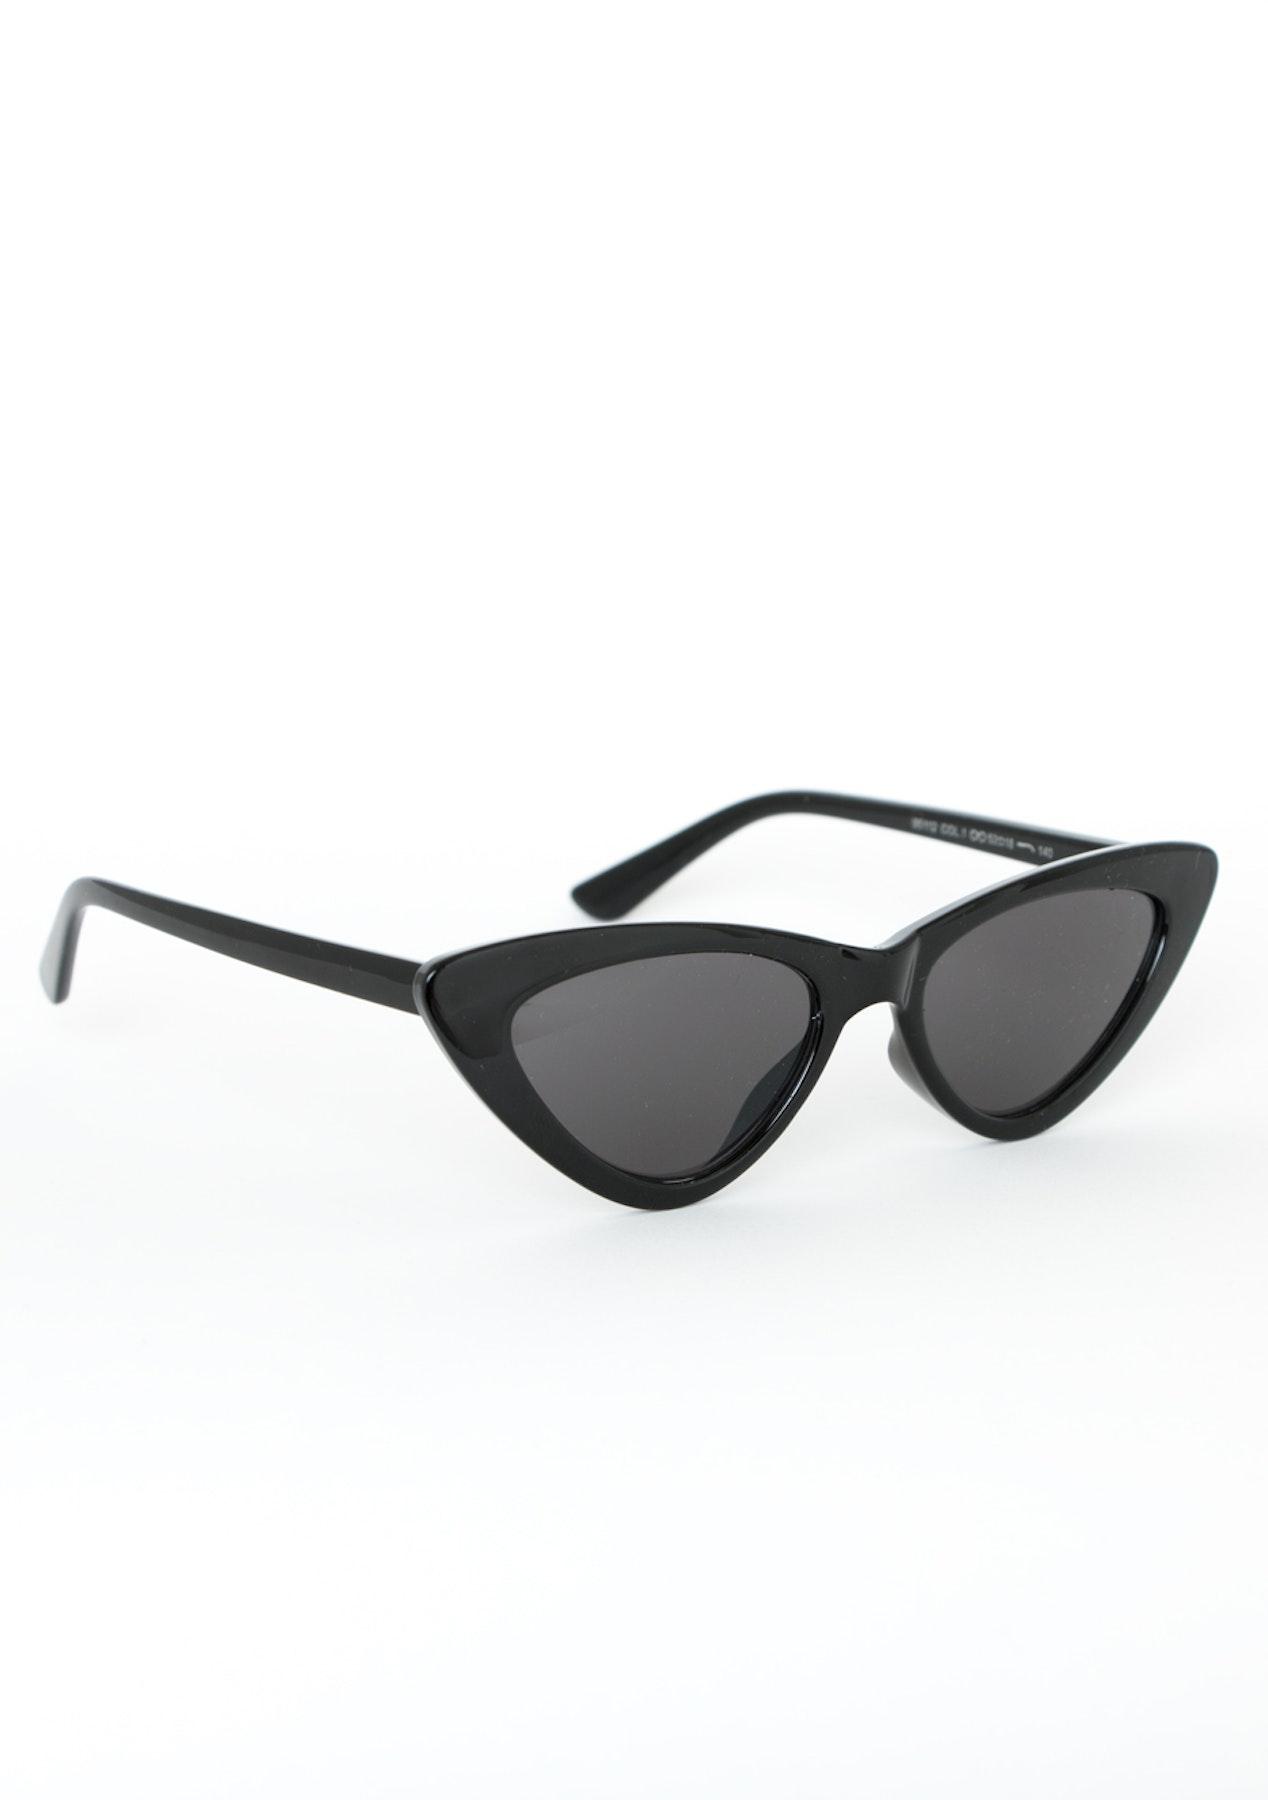 b72494dfda0 Extreme Cat Eye - Black - Eyewear Clear Out - Onceit